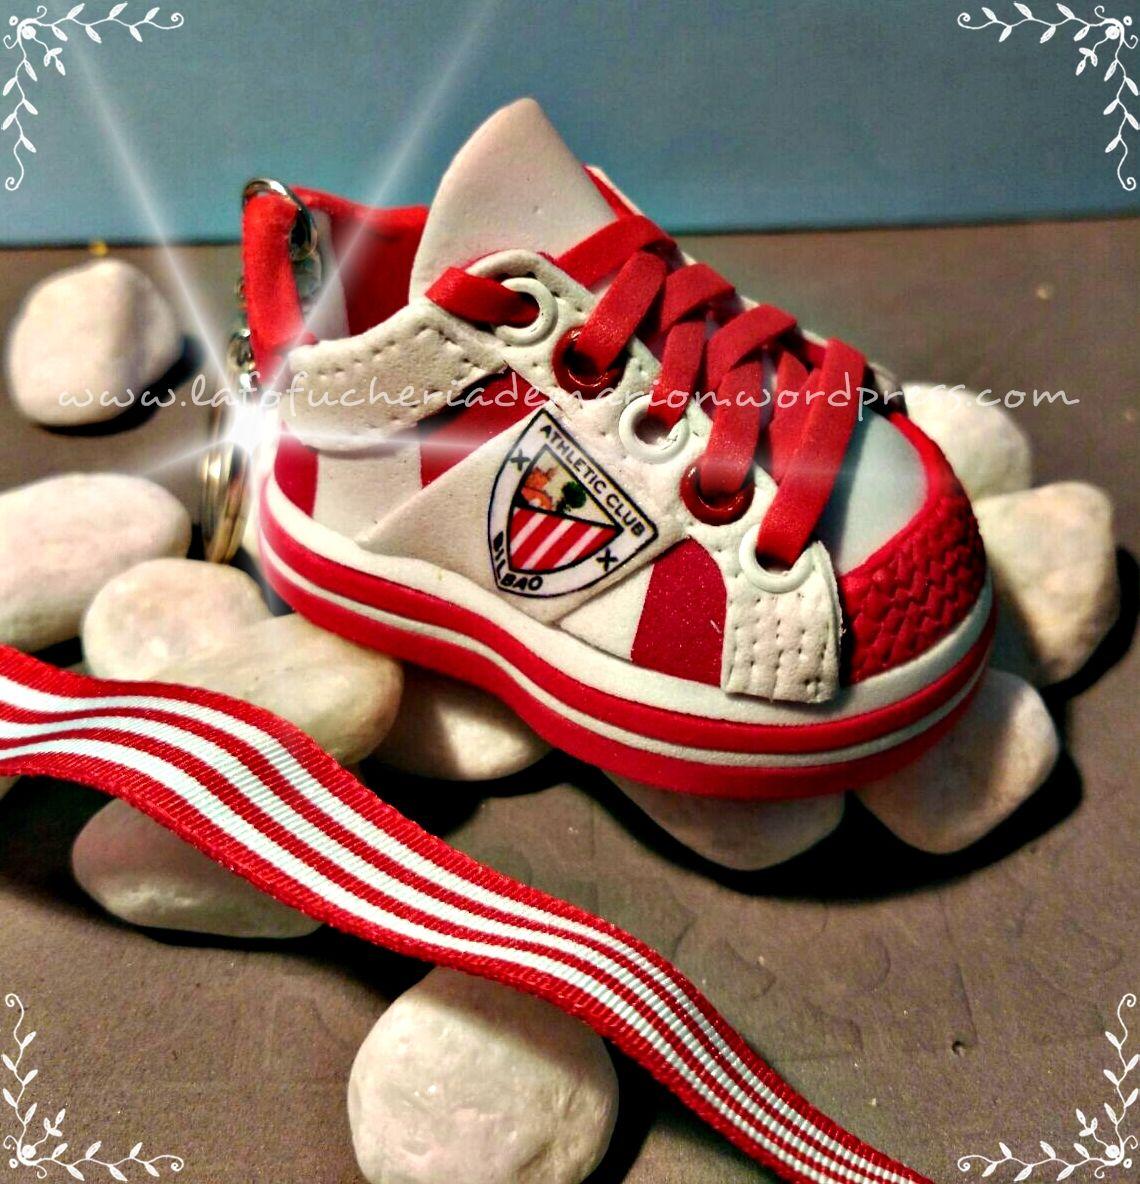 Zapatilla deportiva del AThletic de Bilbao  zapatillafofucha  handmade   lafofucheriademarion  detalleartesanal  zapatilladeportiva d935fdd3e562c